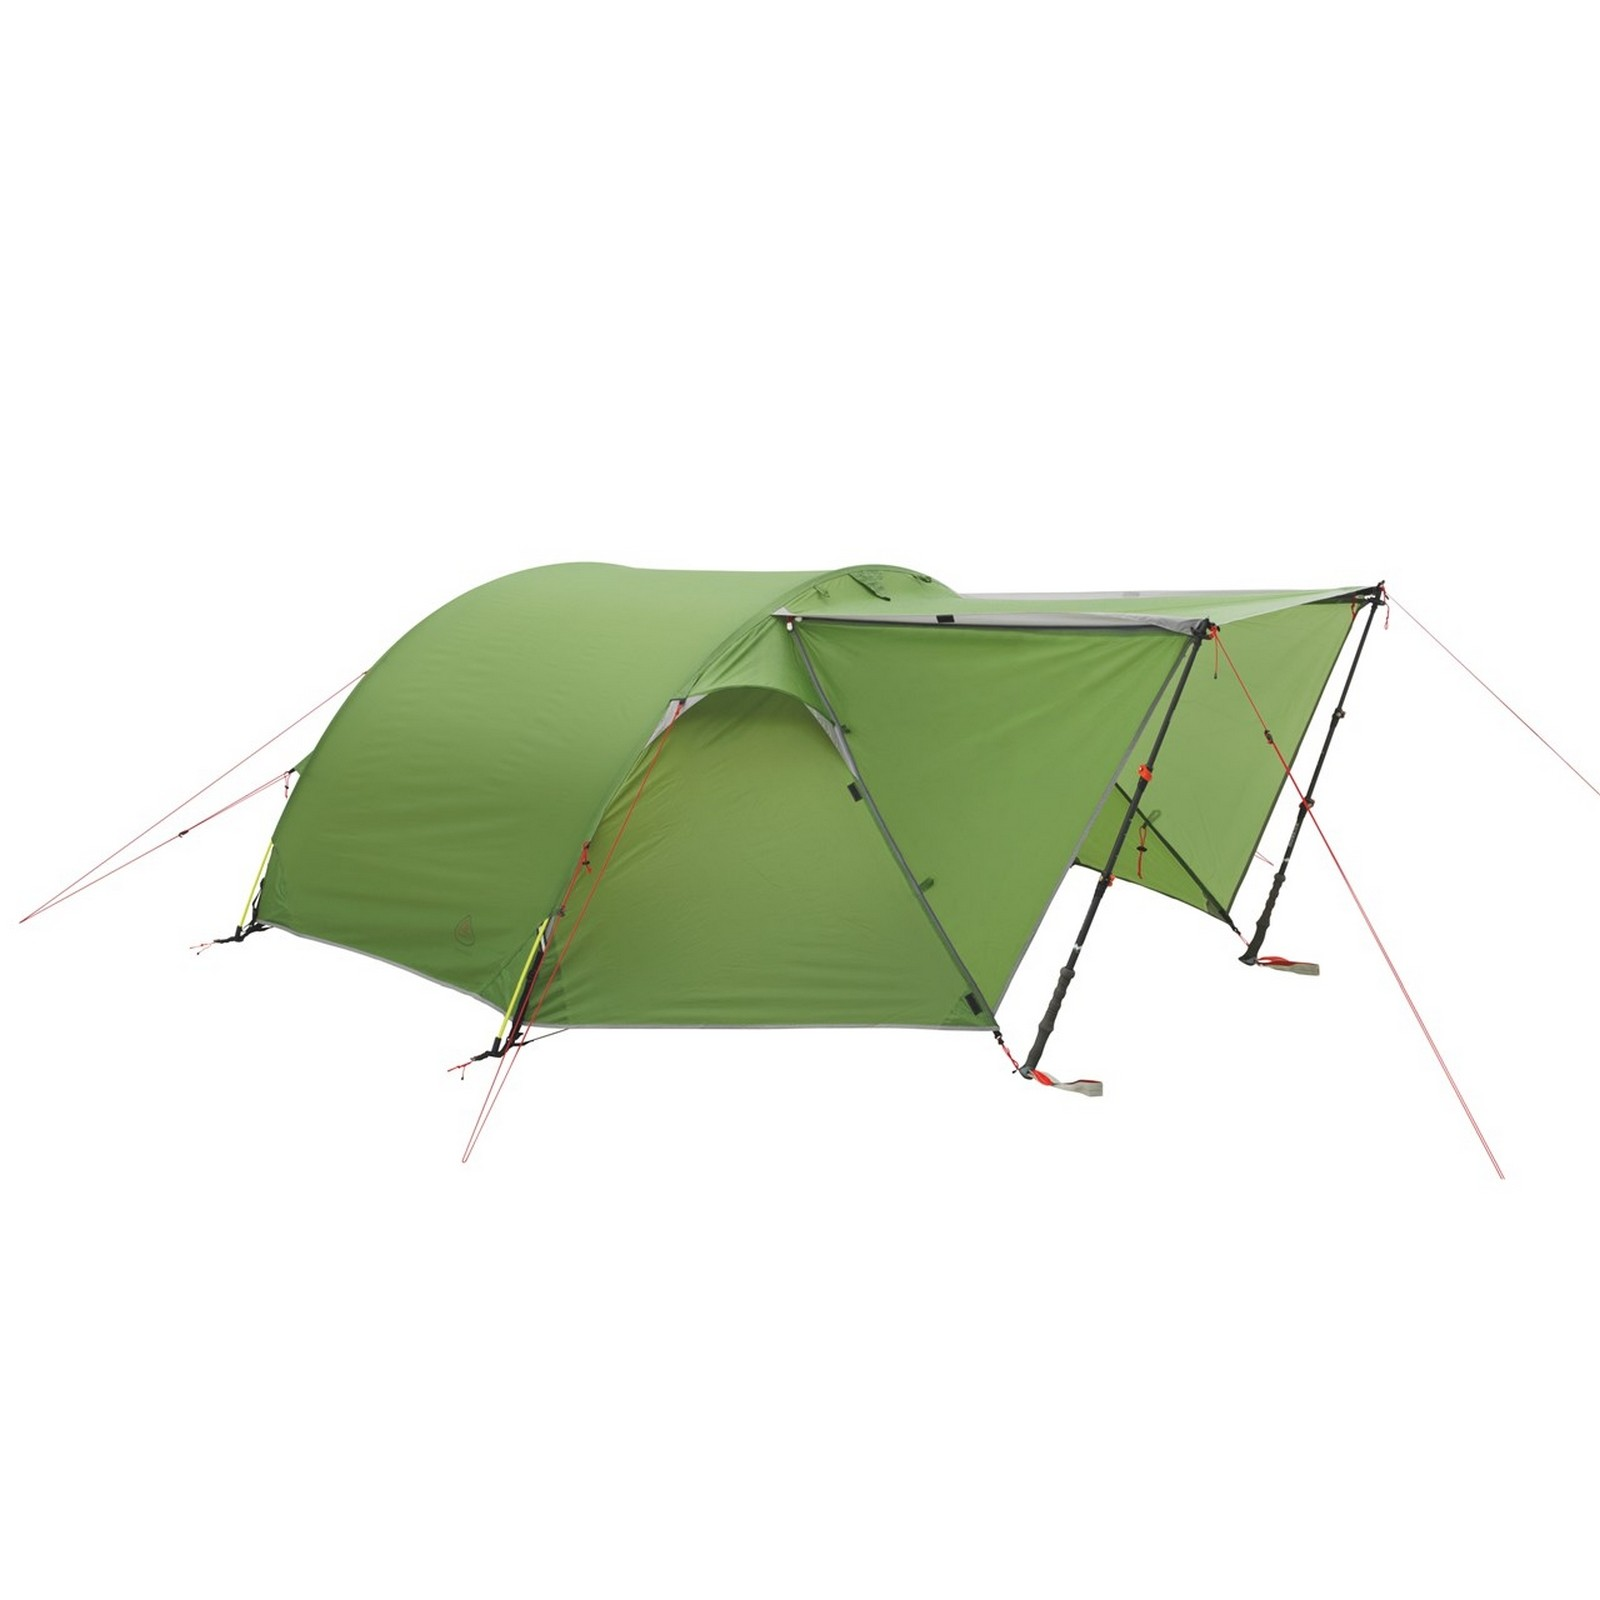 Zelt Für Wanderer : Zelt tunnelzelt campingzelt partnerzelt goshawk für